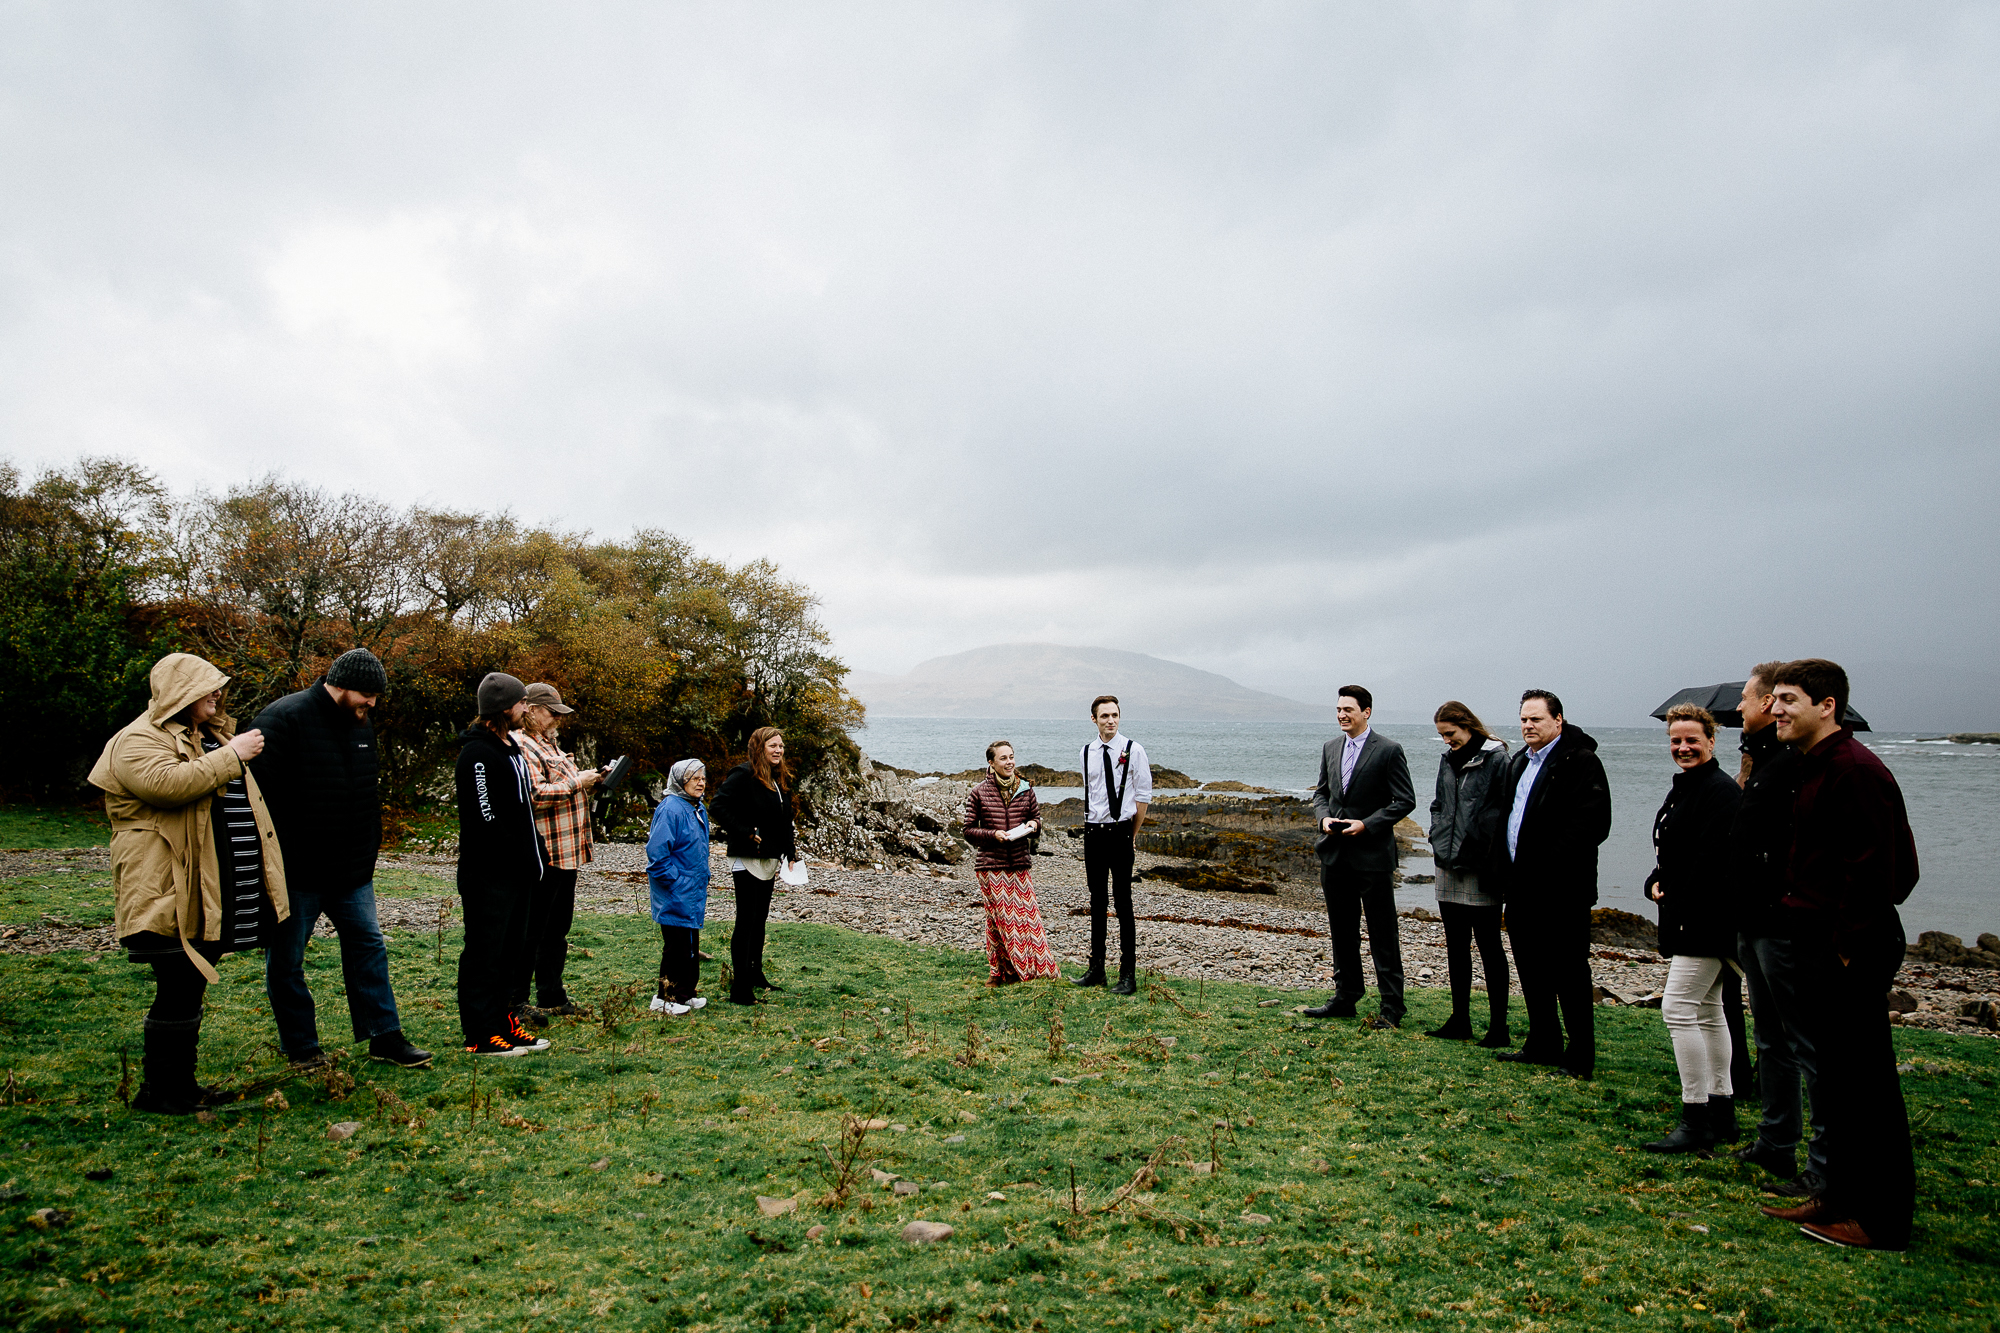 Jen_Montgomery_Photography_Scotland_Wedding_CorrieWill_FB-147.jpg